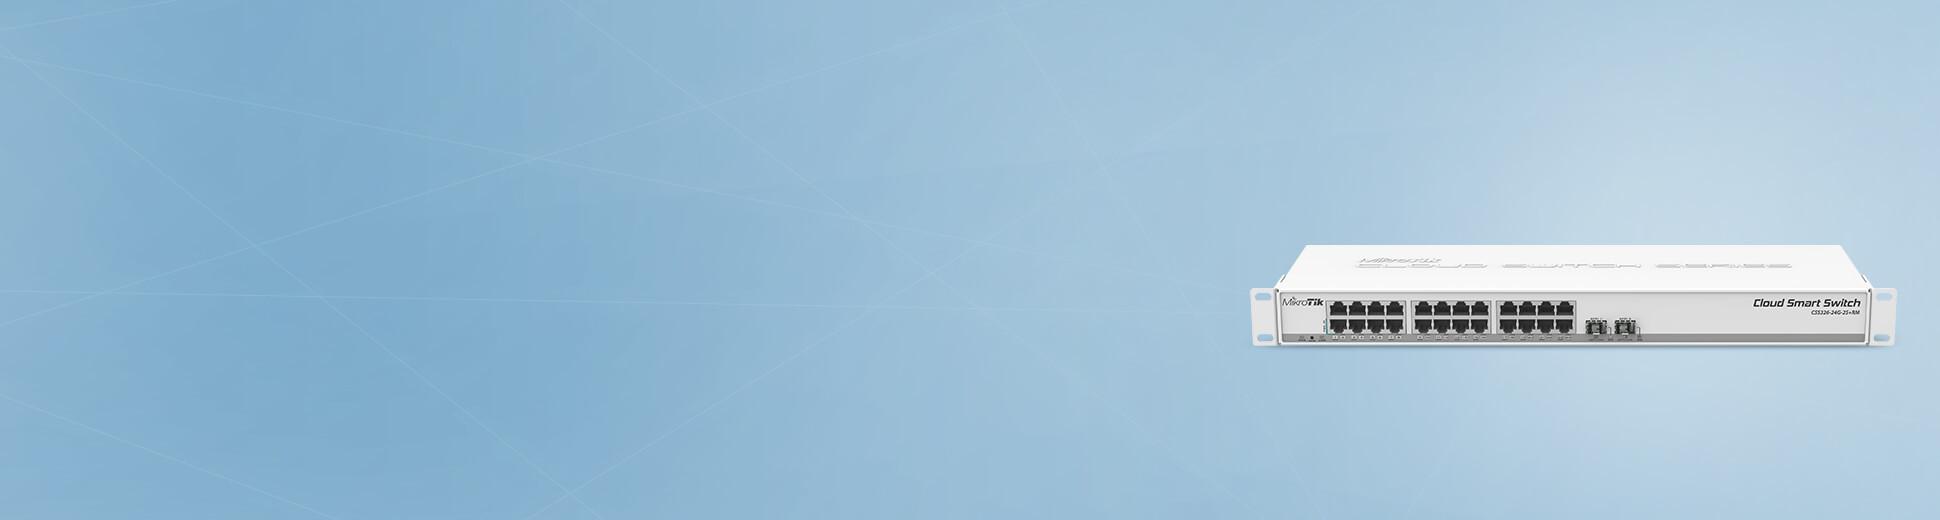 مبکروتیک CRS326-24G-2S RM | روتربرد  CRS326-24G-2S RM